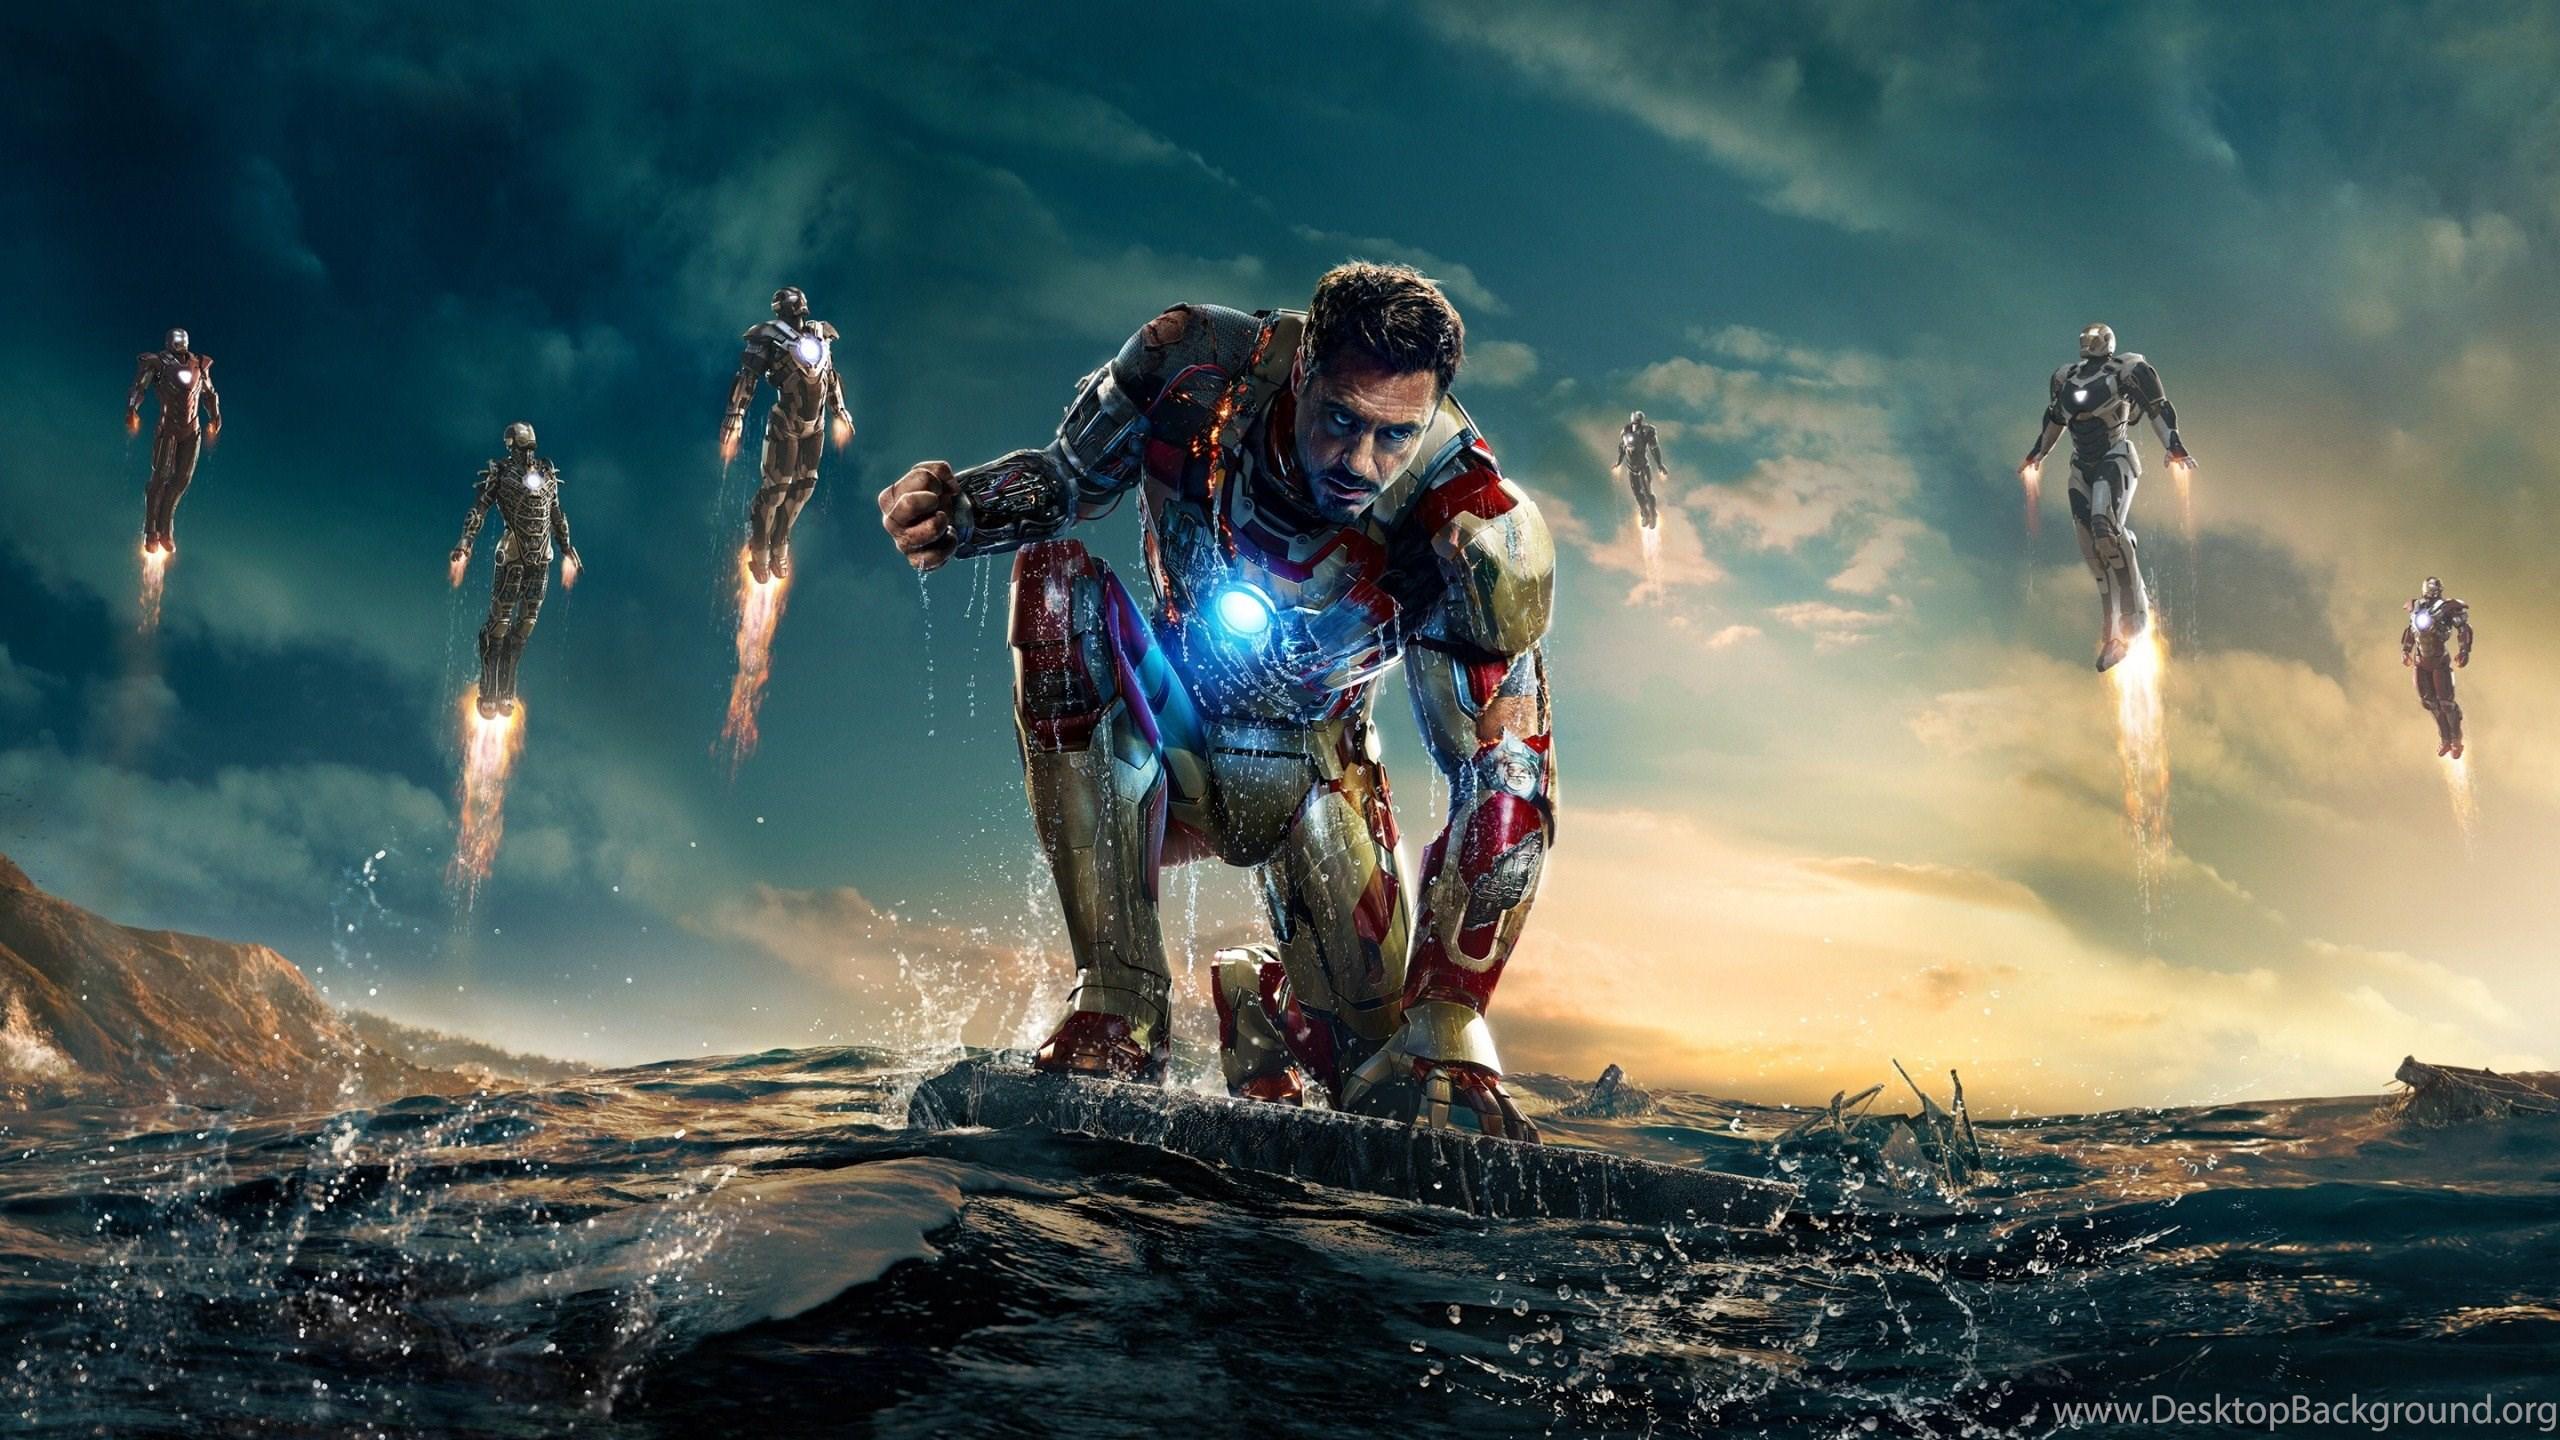 Iron Man 3 Movie Poster Wallpapers Desktop Background